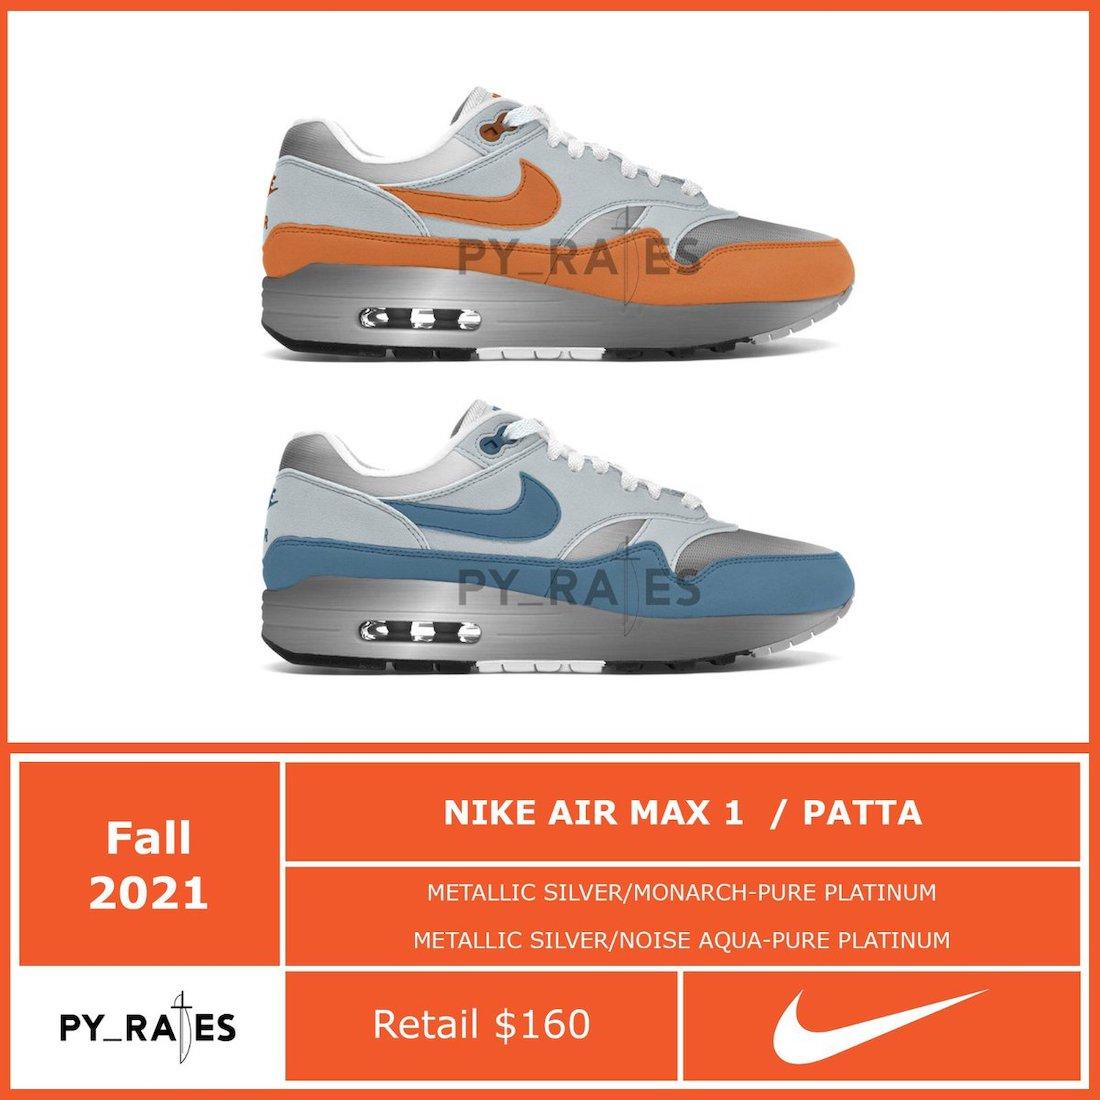 Swoosh, Nike Air Max 1, Nike Air Max, Nike Air, NIKE, Air Max 1, Air Max